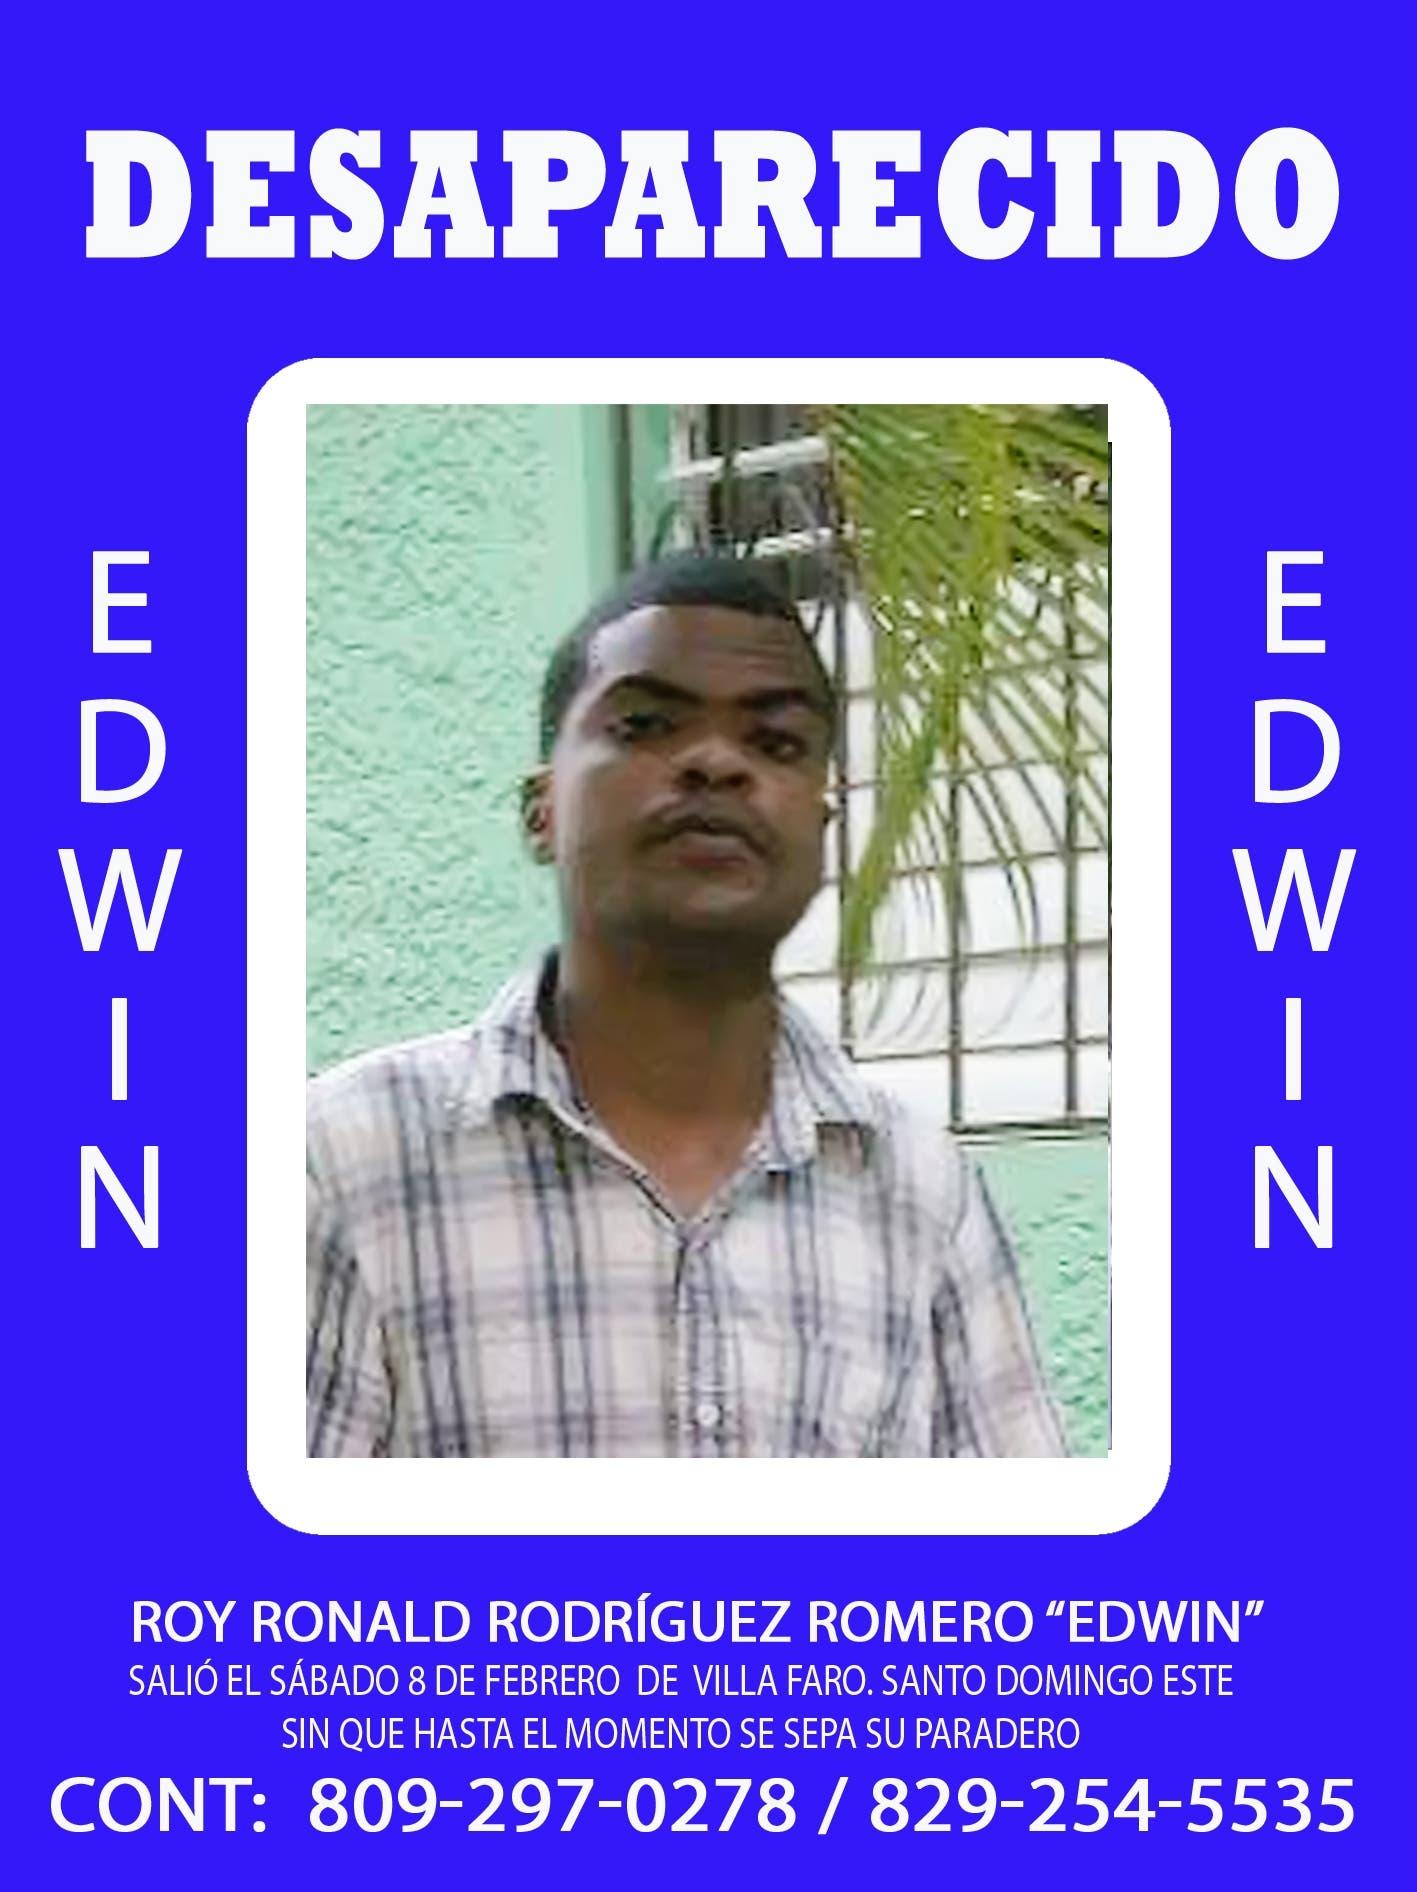 Edwin, desaparecido